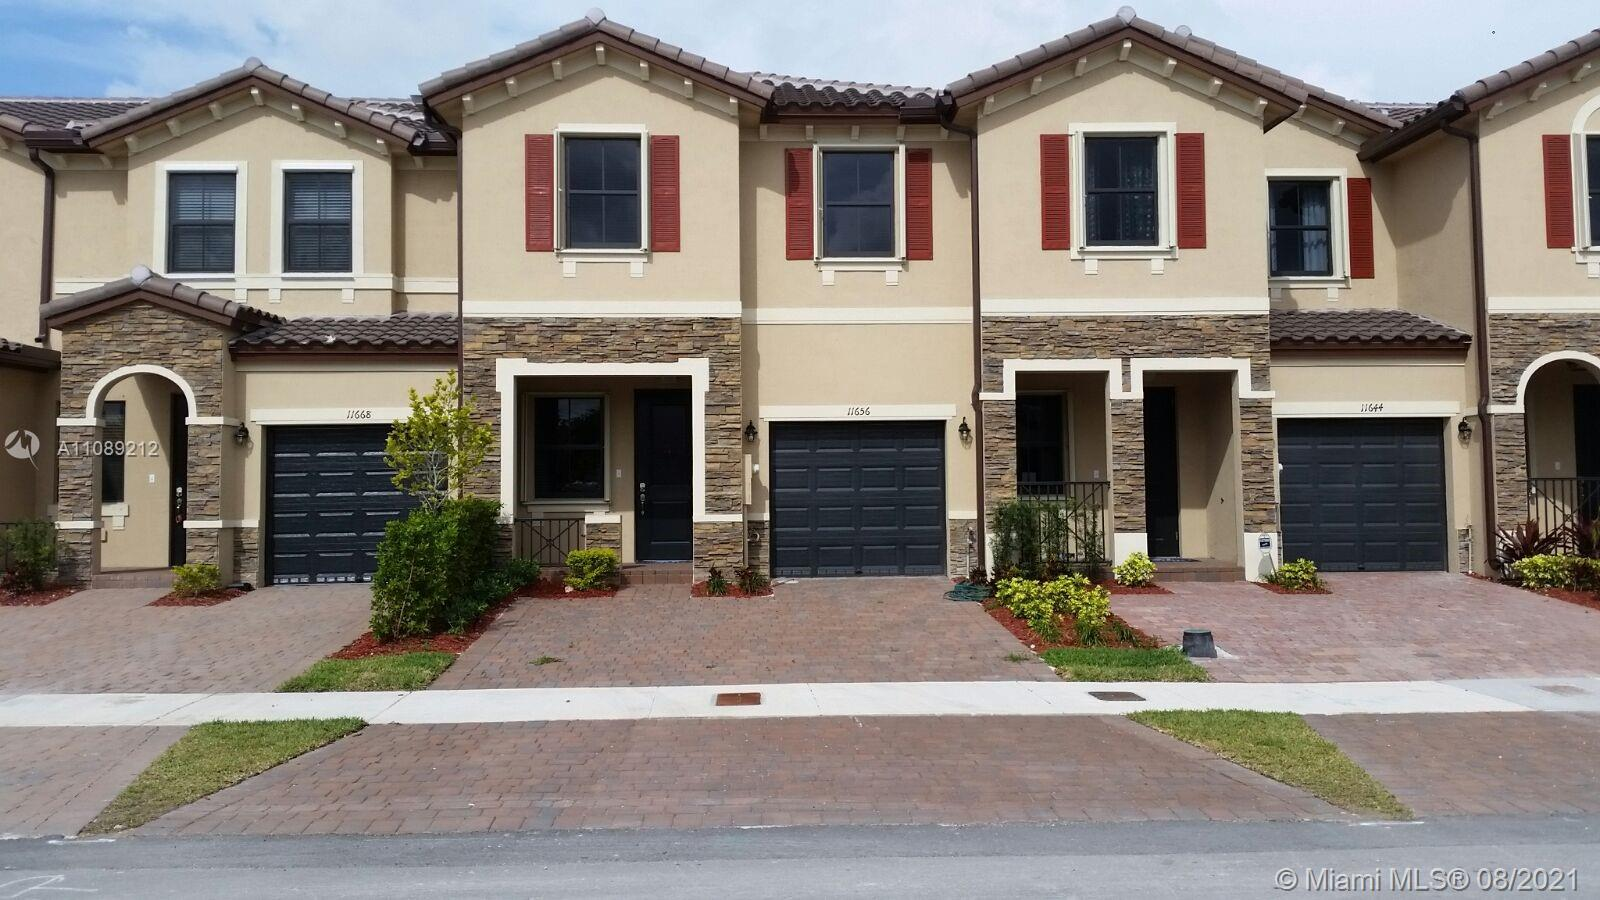 Hammocks #11656 - 11656 SW 151st Ave #11656, Miami, FL 33196